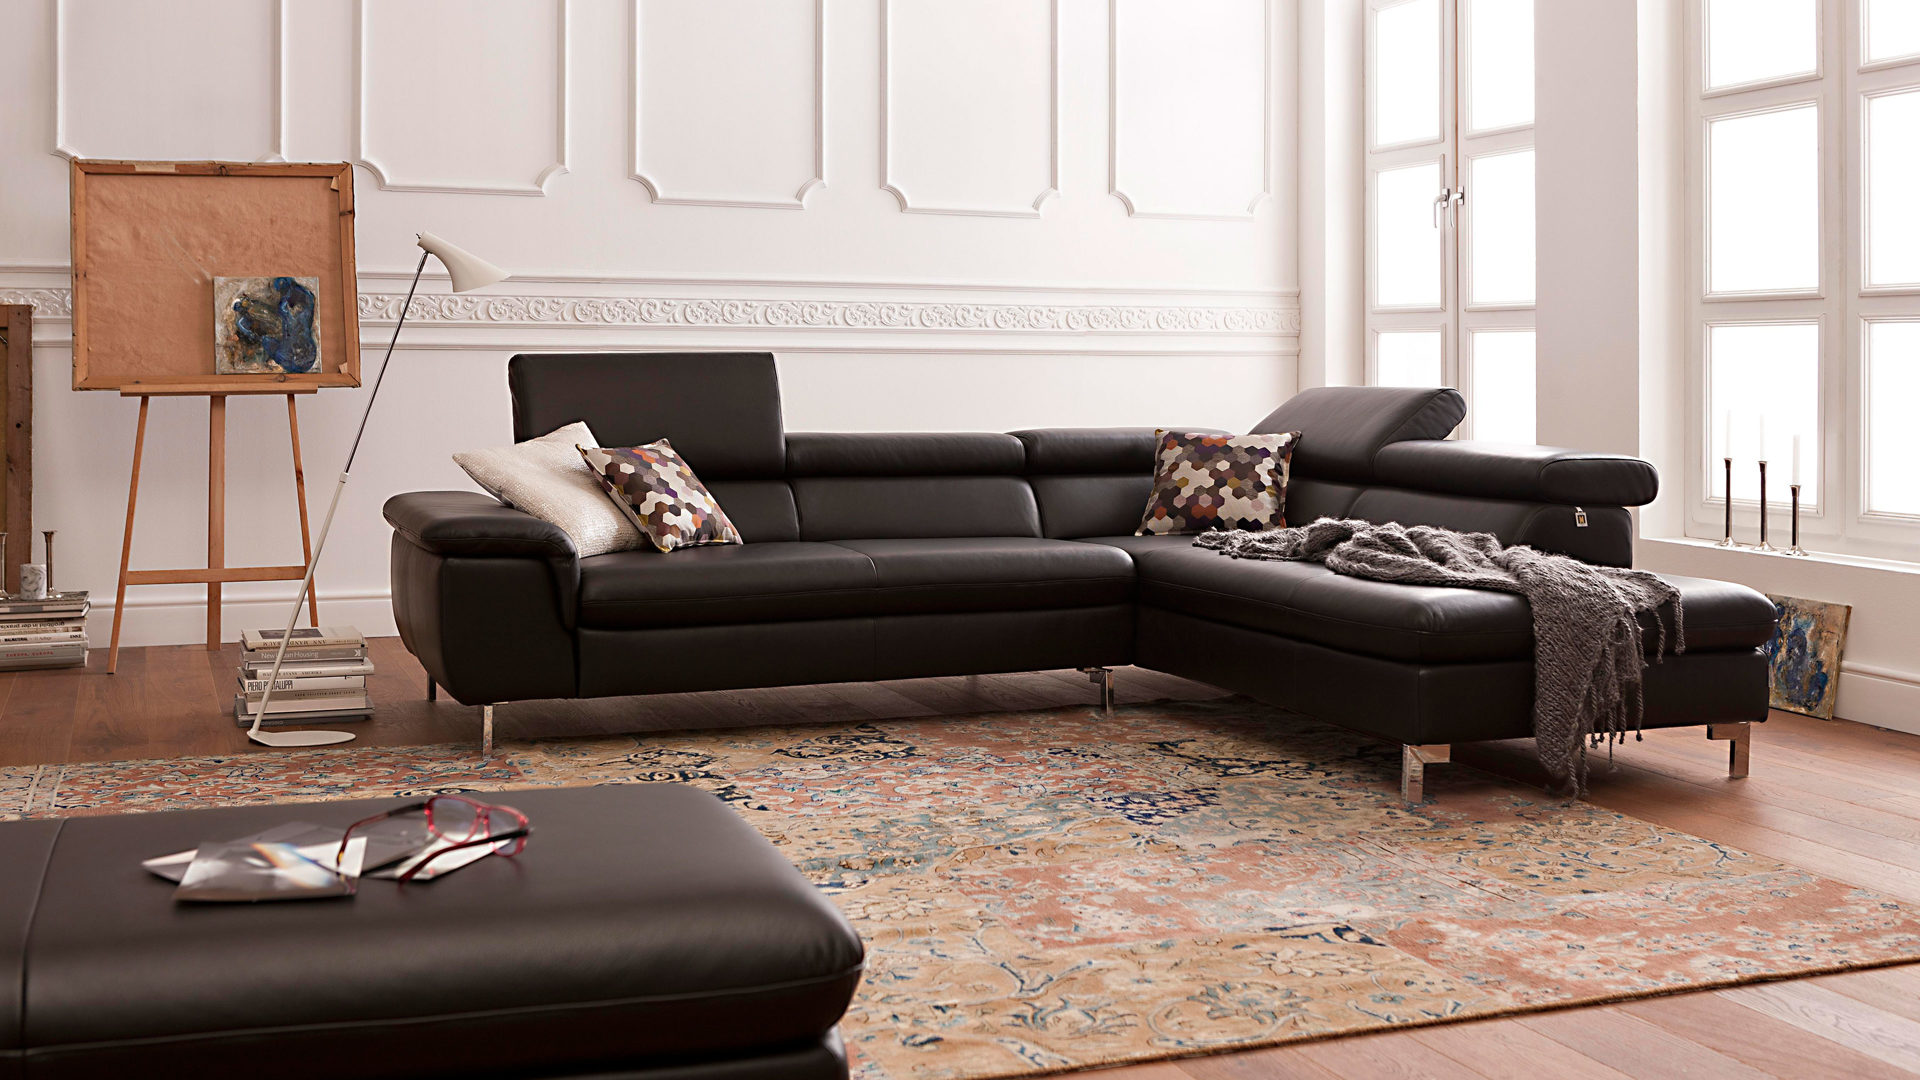 Ledercouch Sale Design Schlafsofa Designer Gunstig Sofa Leder